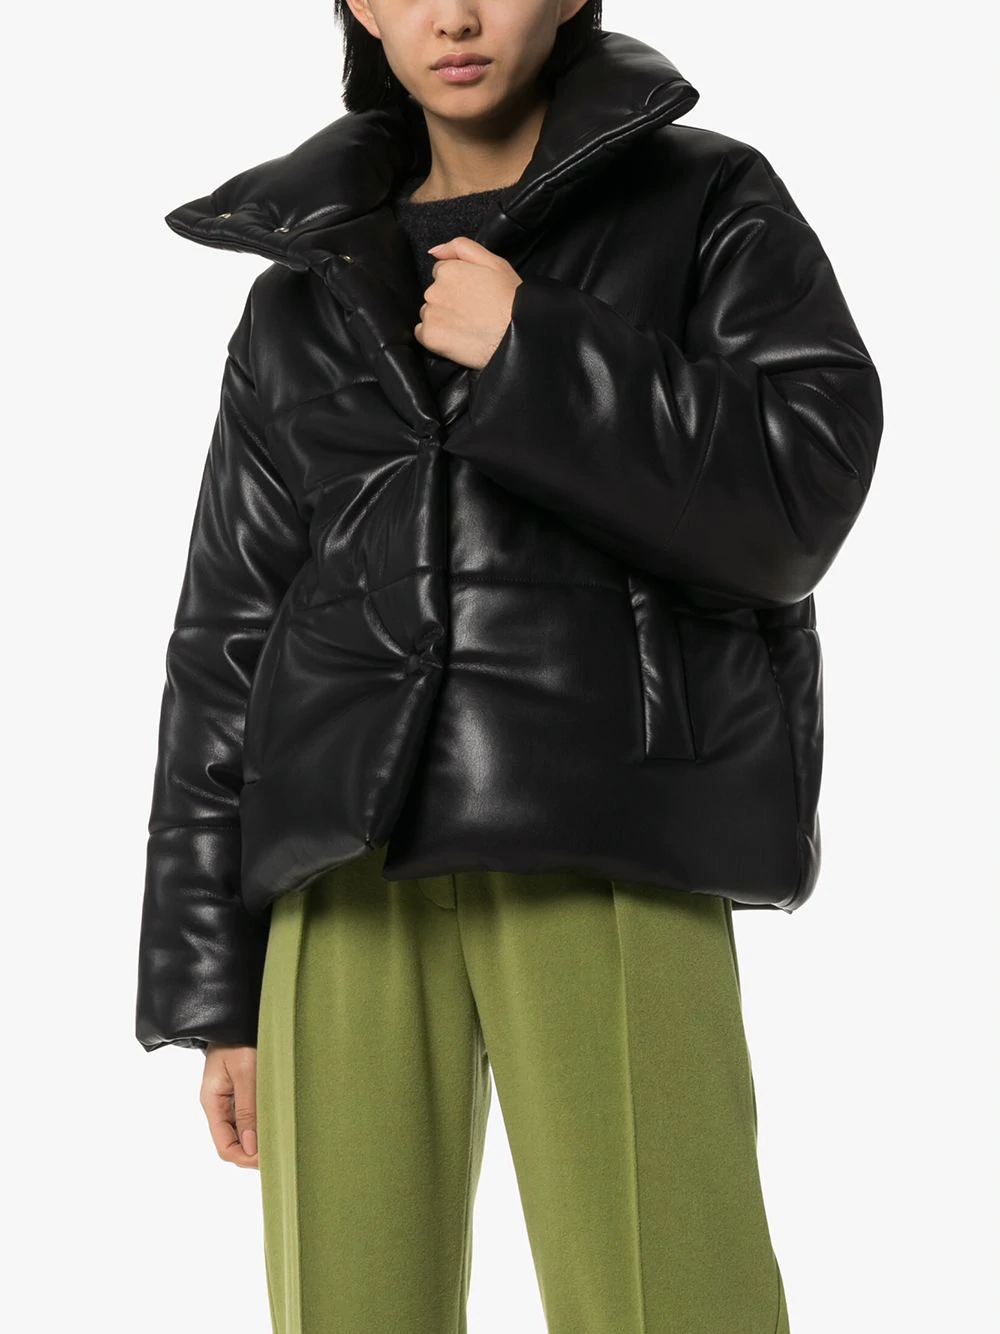 Nanushka Hide Vegan Leather Puffer Jacket Farfetch In 2020 Vegan Leather Puffer Jackets Jackets [ 1334 x 1000 Pixel ]